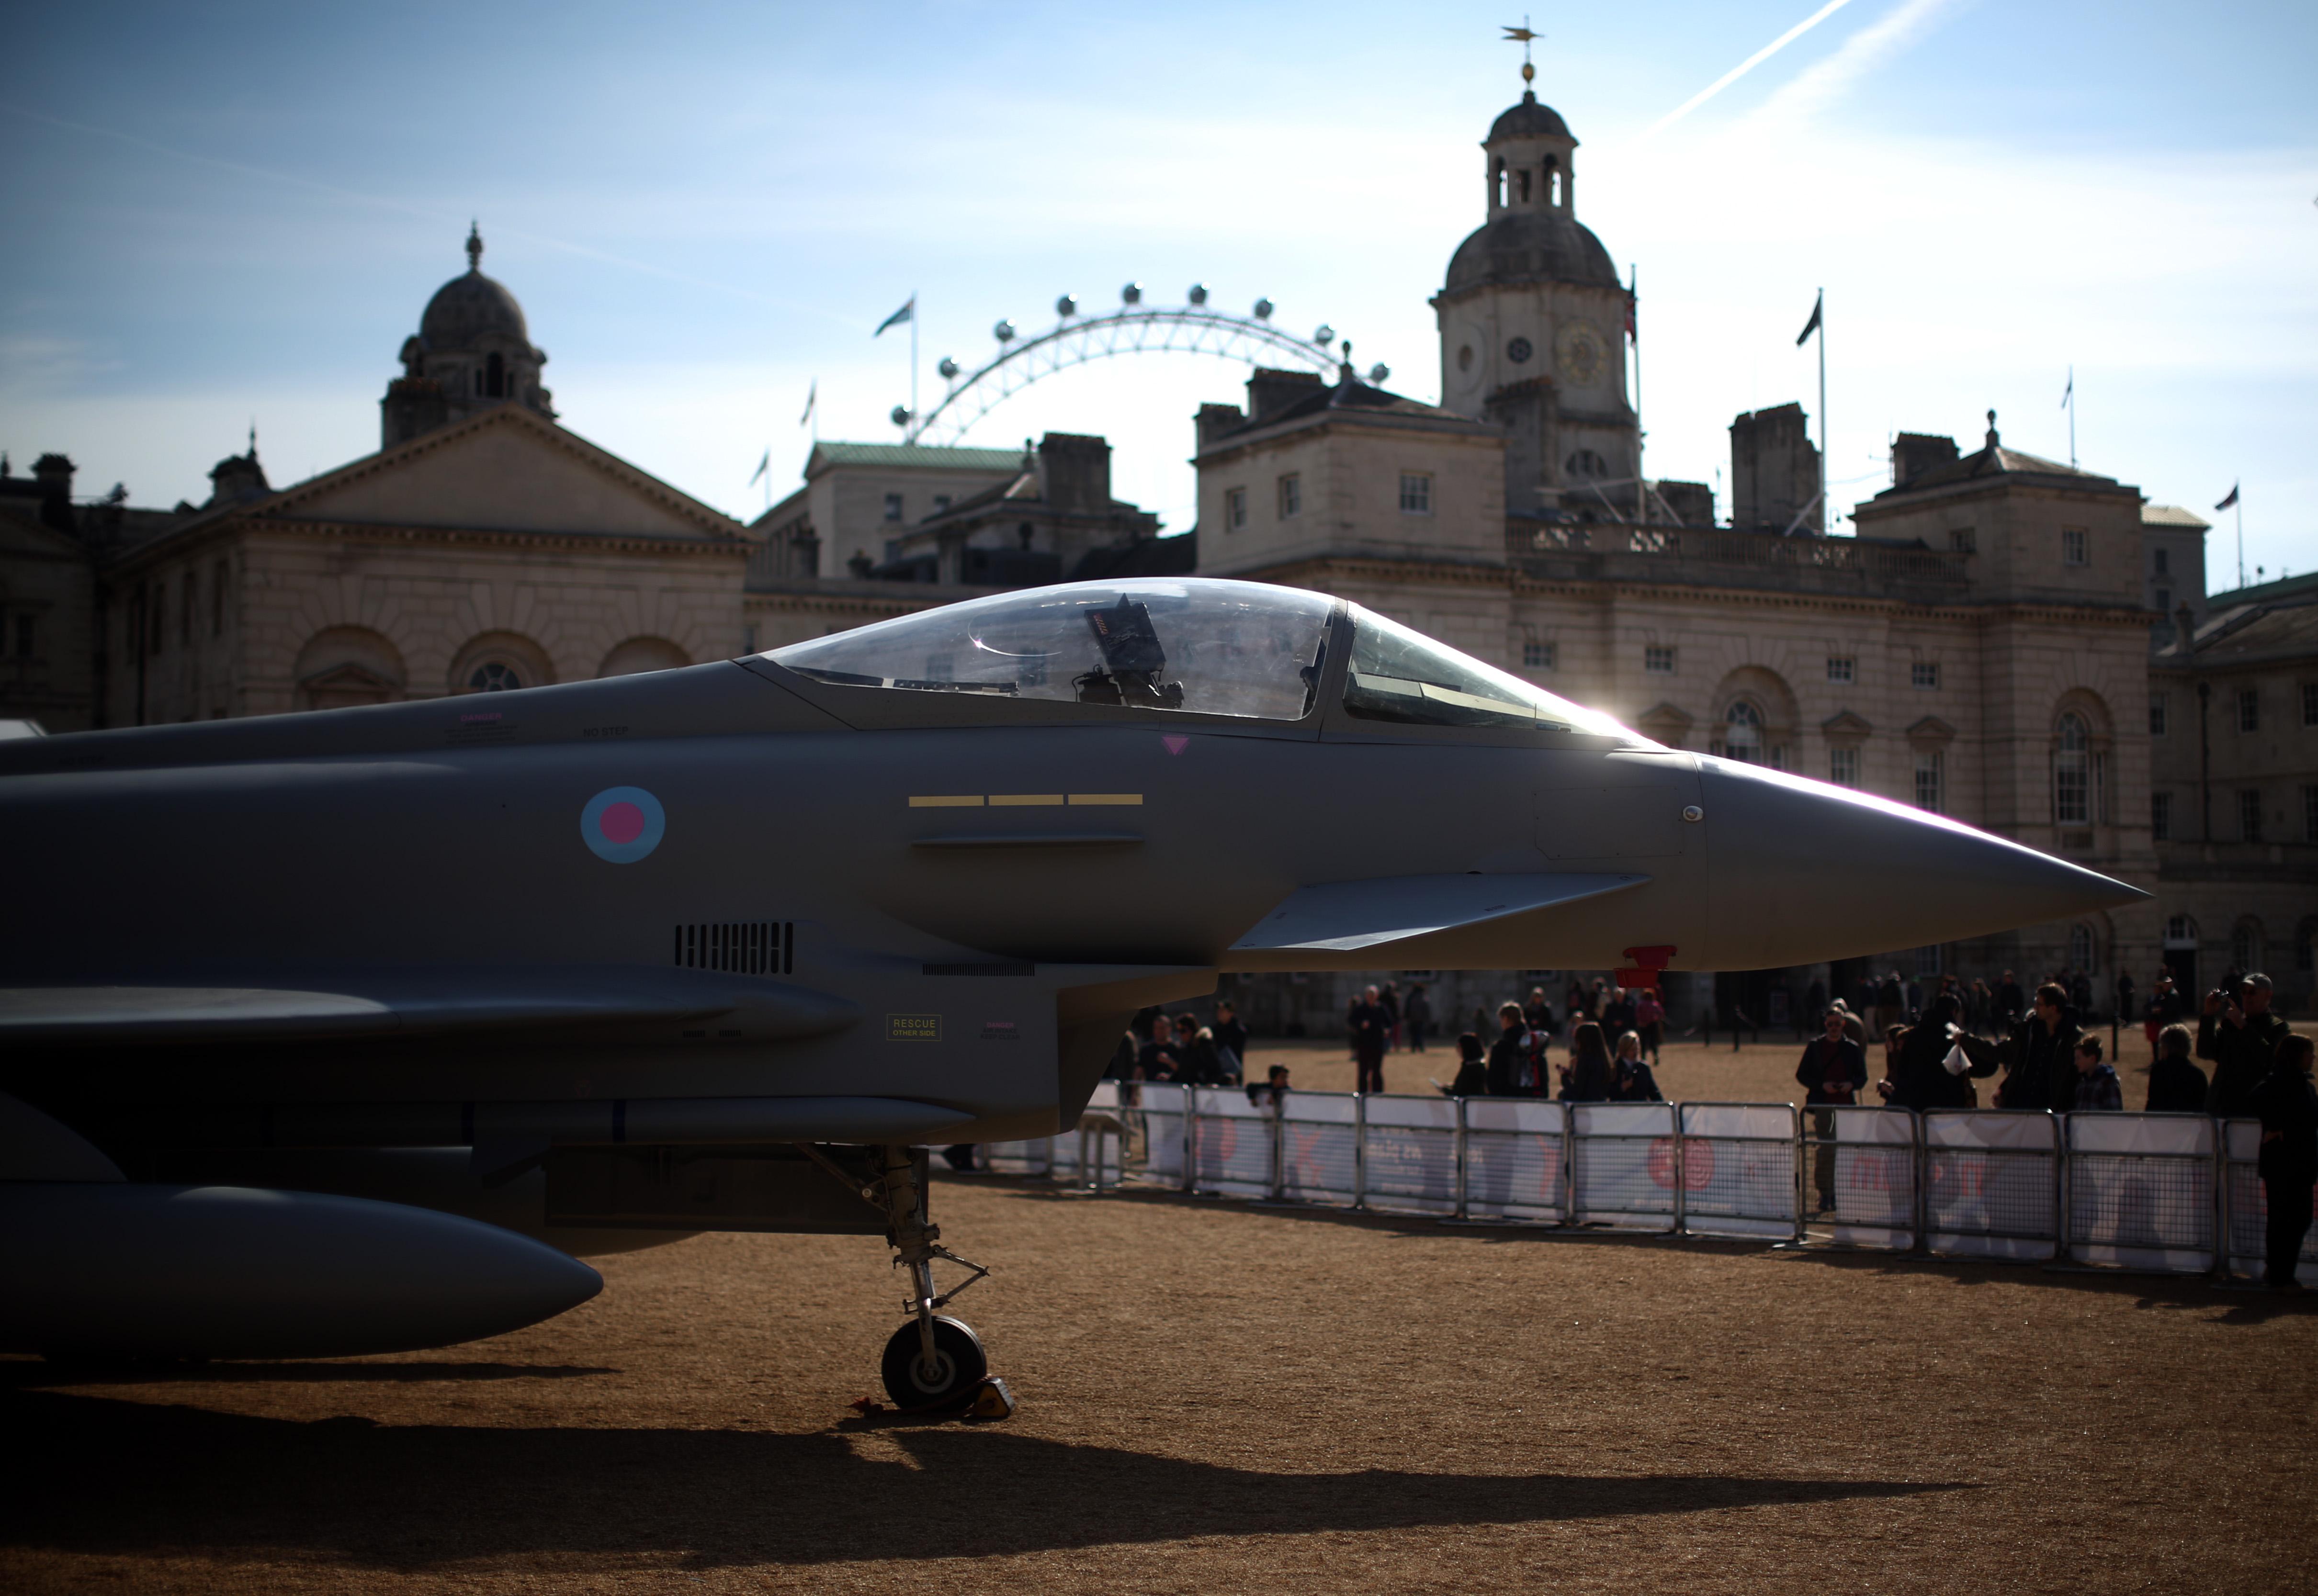 RAF Museum Assembles War Aircraft For Public Display